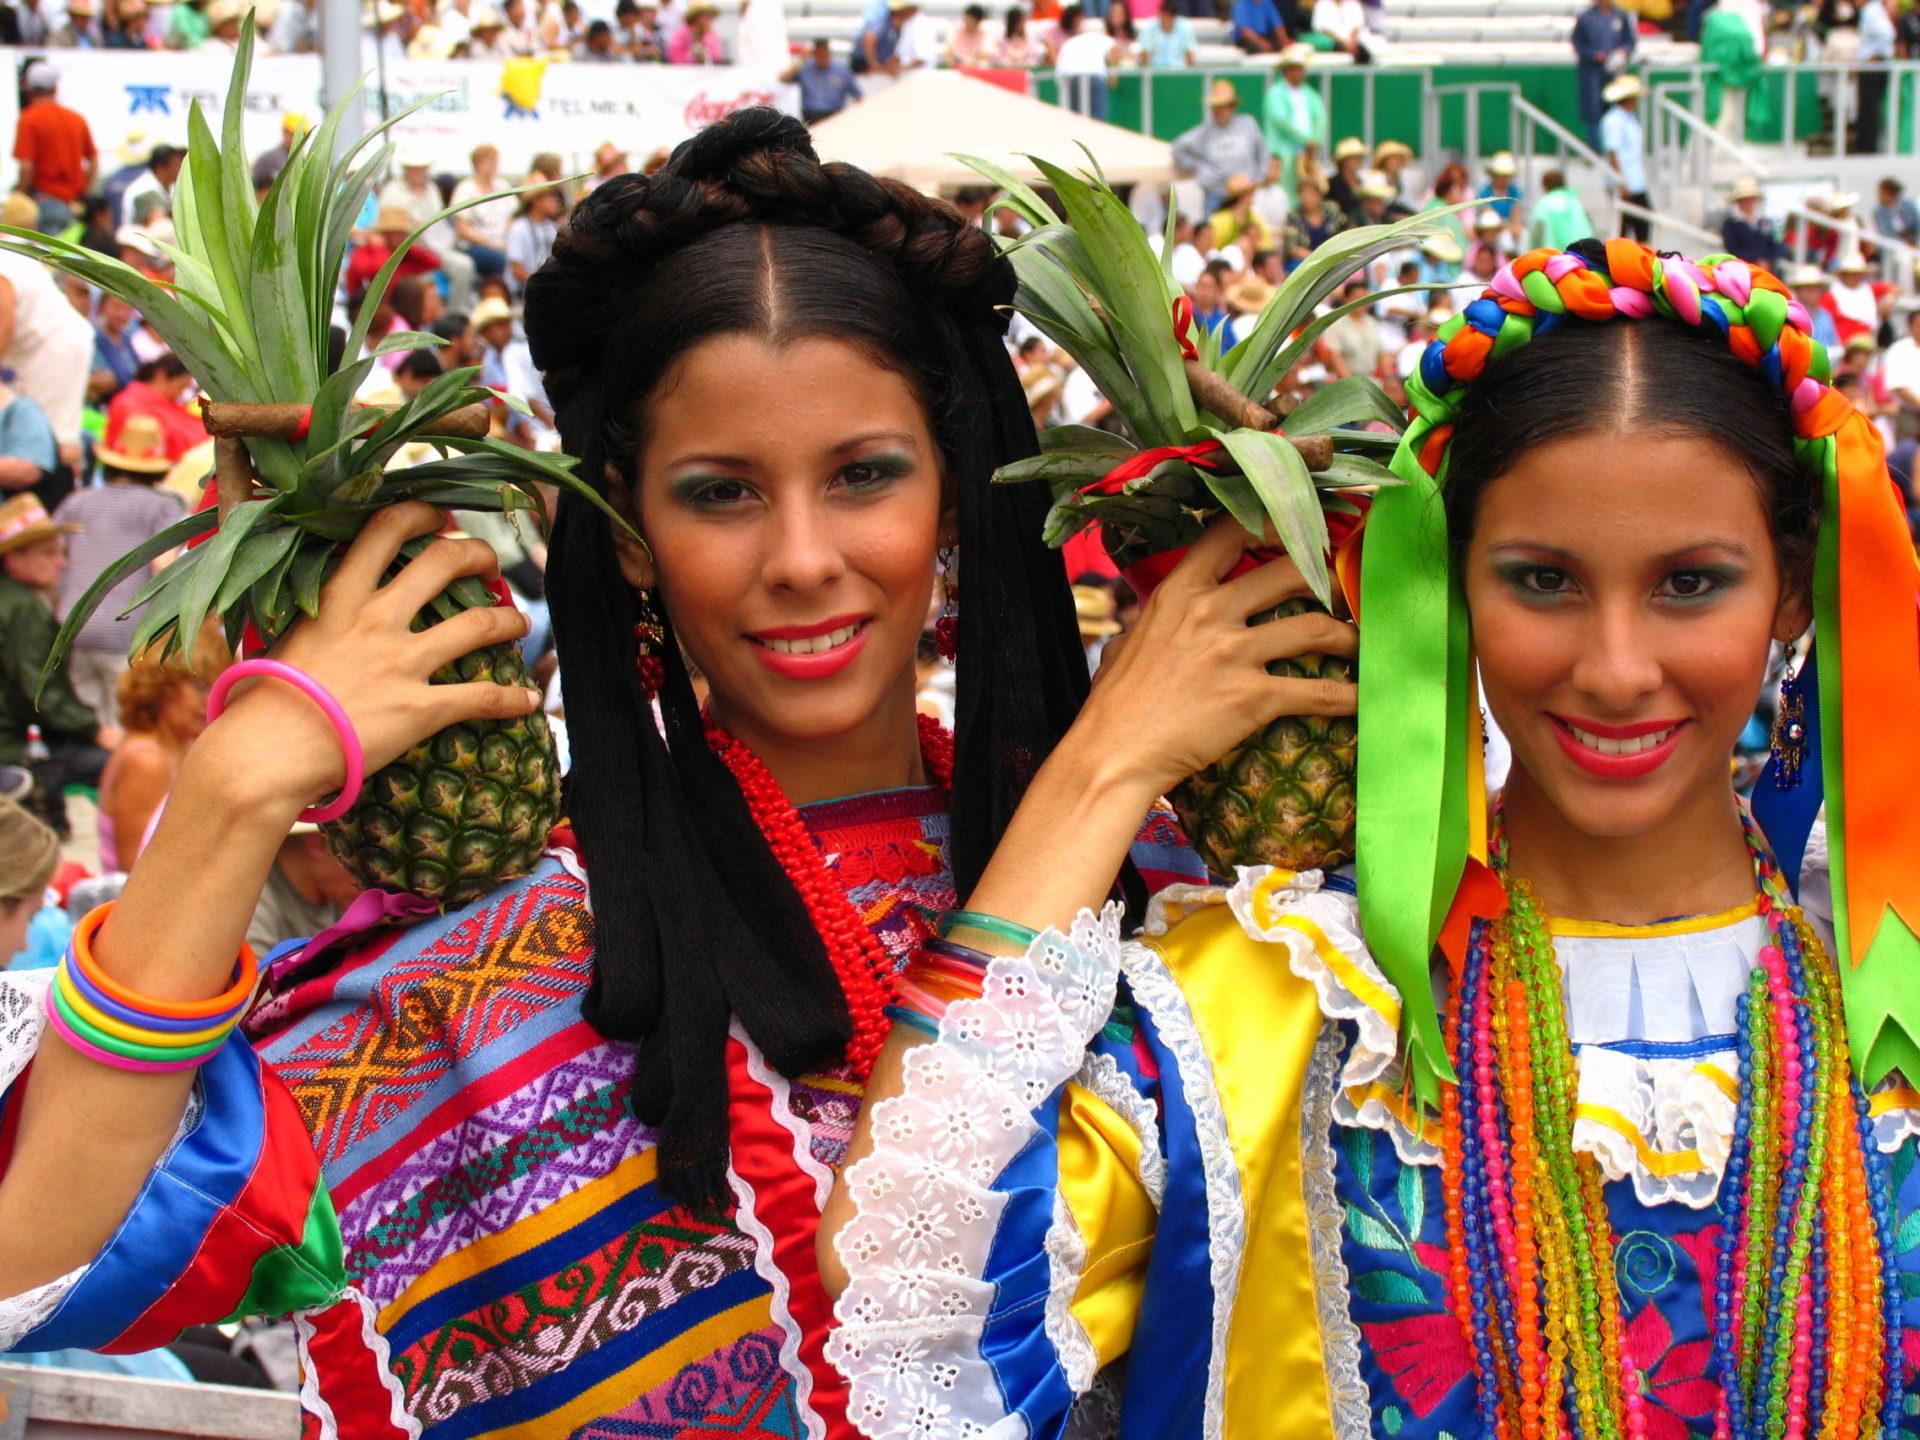 meksikanki-sovremennie-foto-erotika-krasivie-zhenskie-figuri-s-nebritimi-lobkami